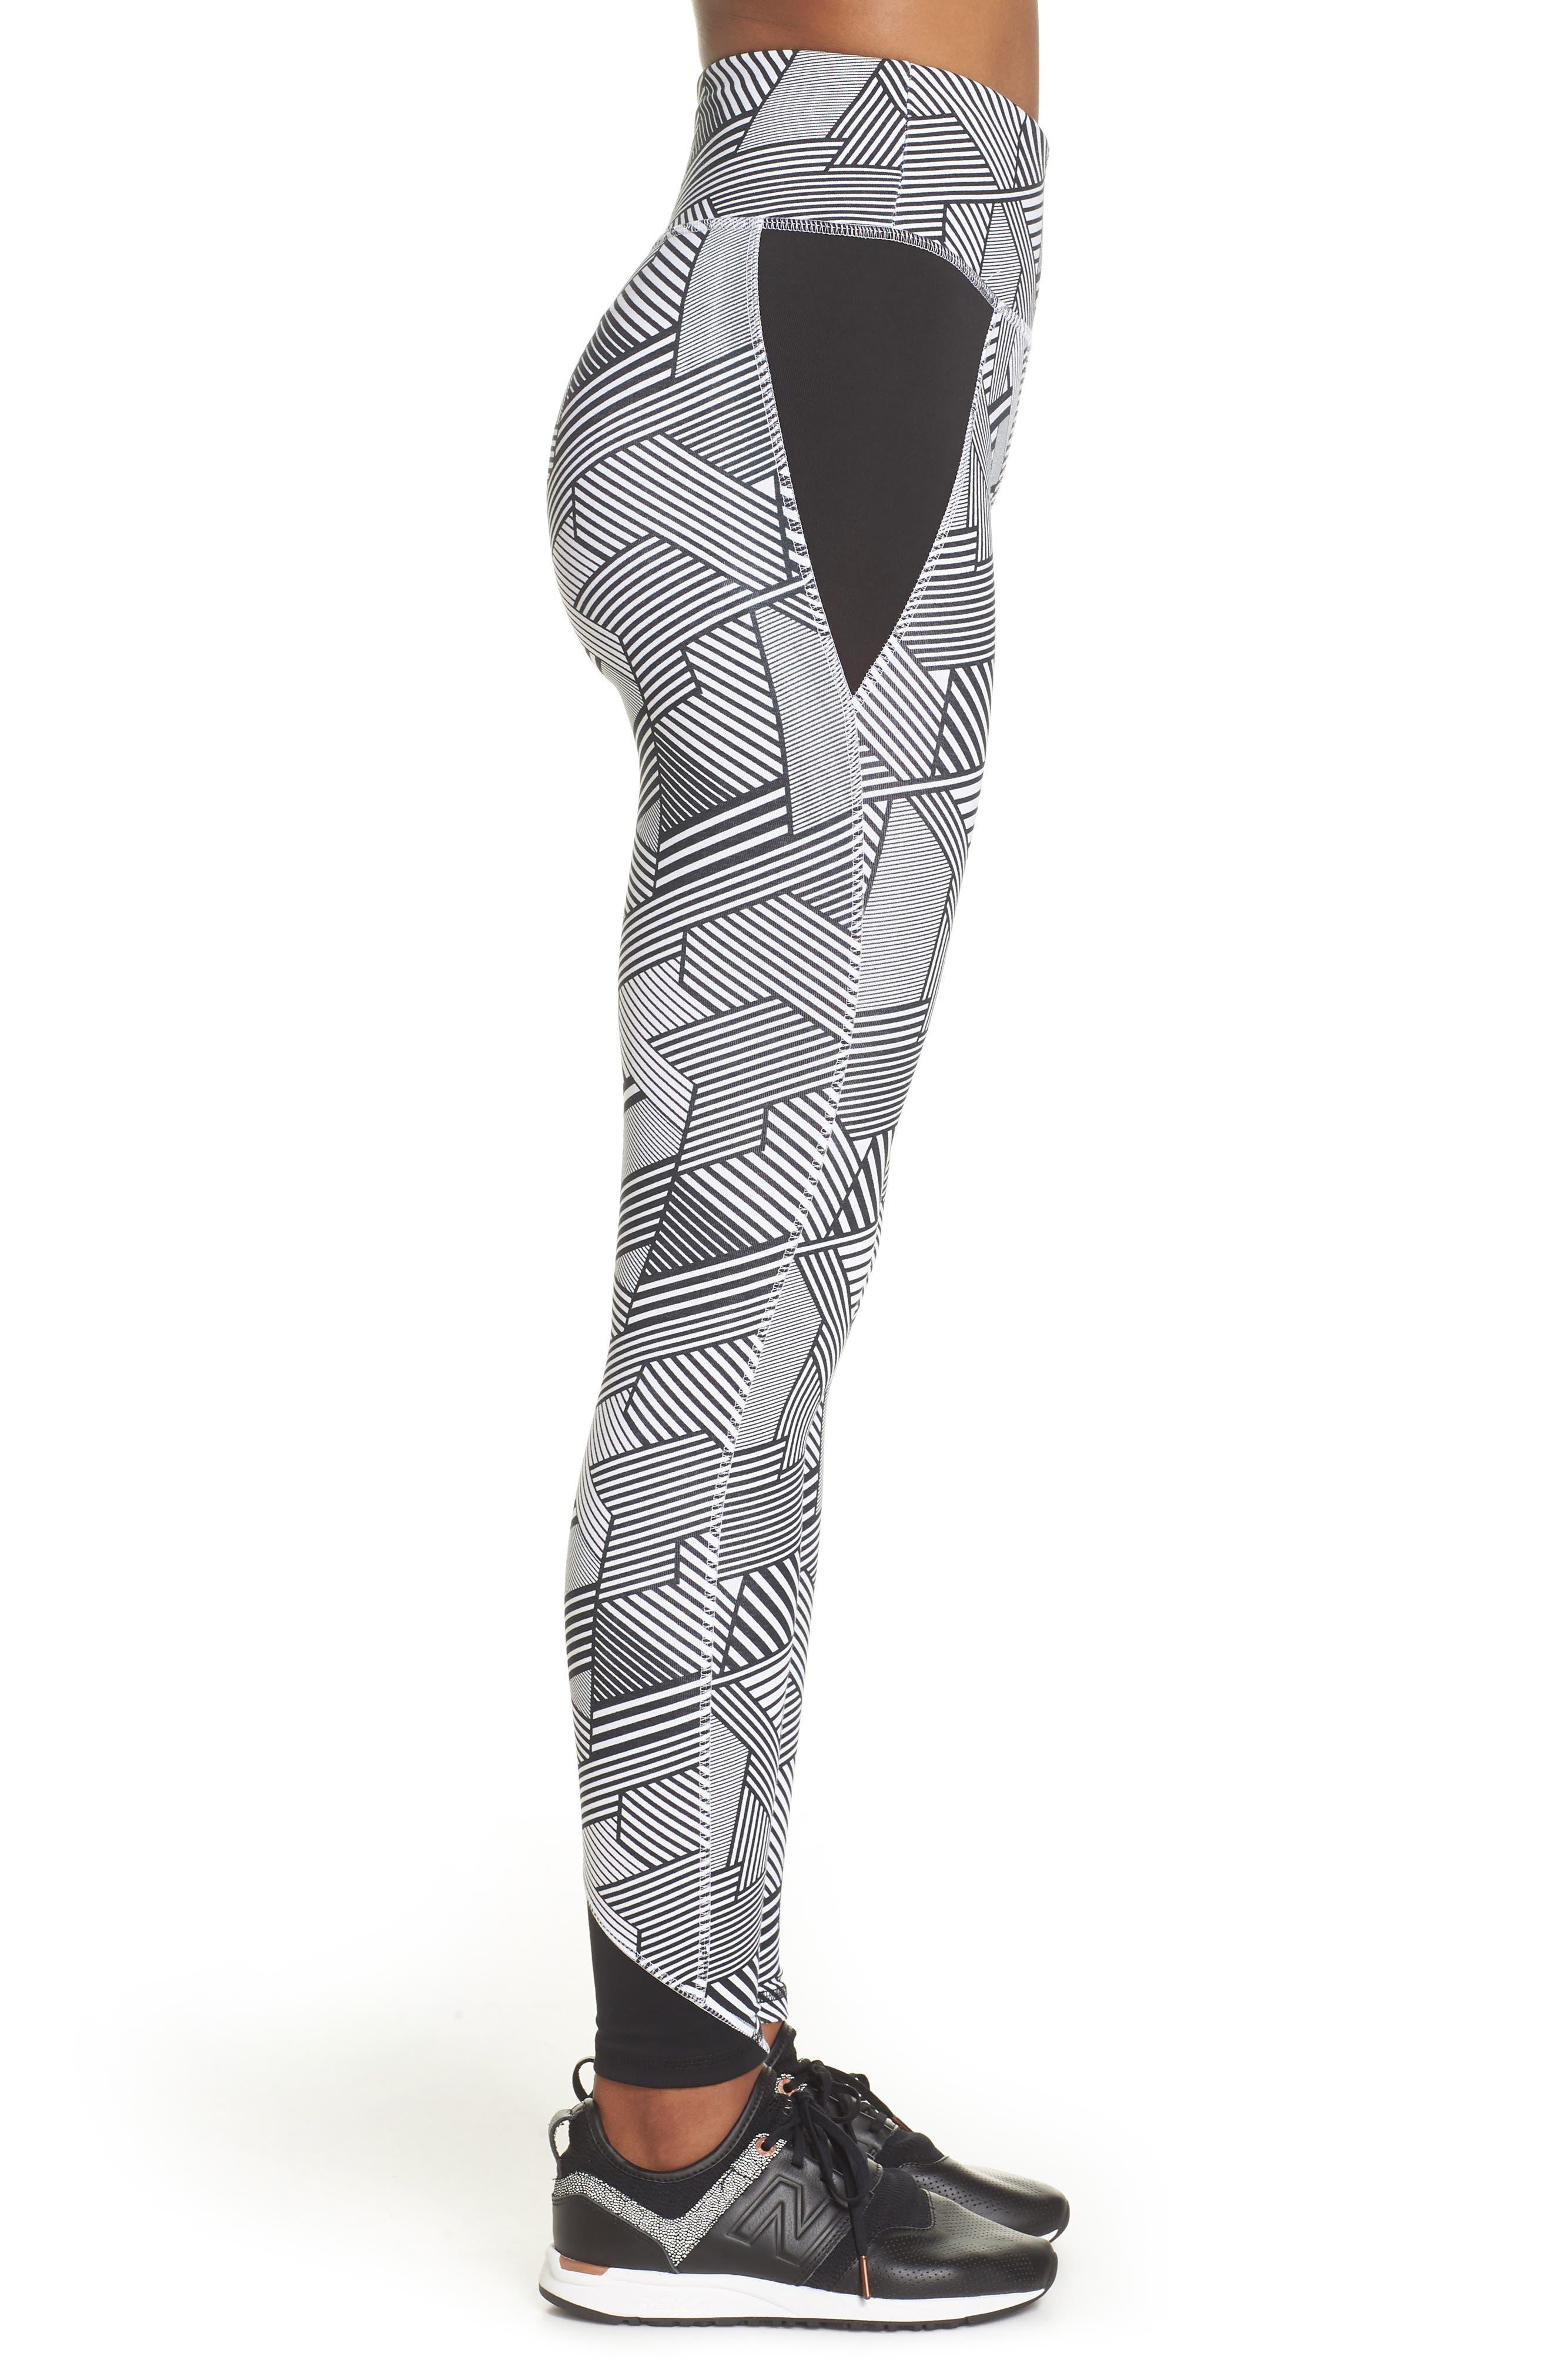 247 Sport Leggings,                             Alternate thumbnail 3, color,                             Black Multi